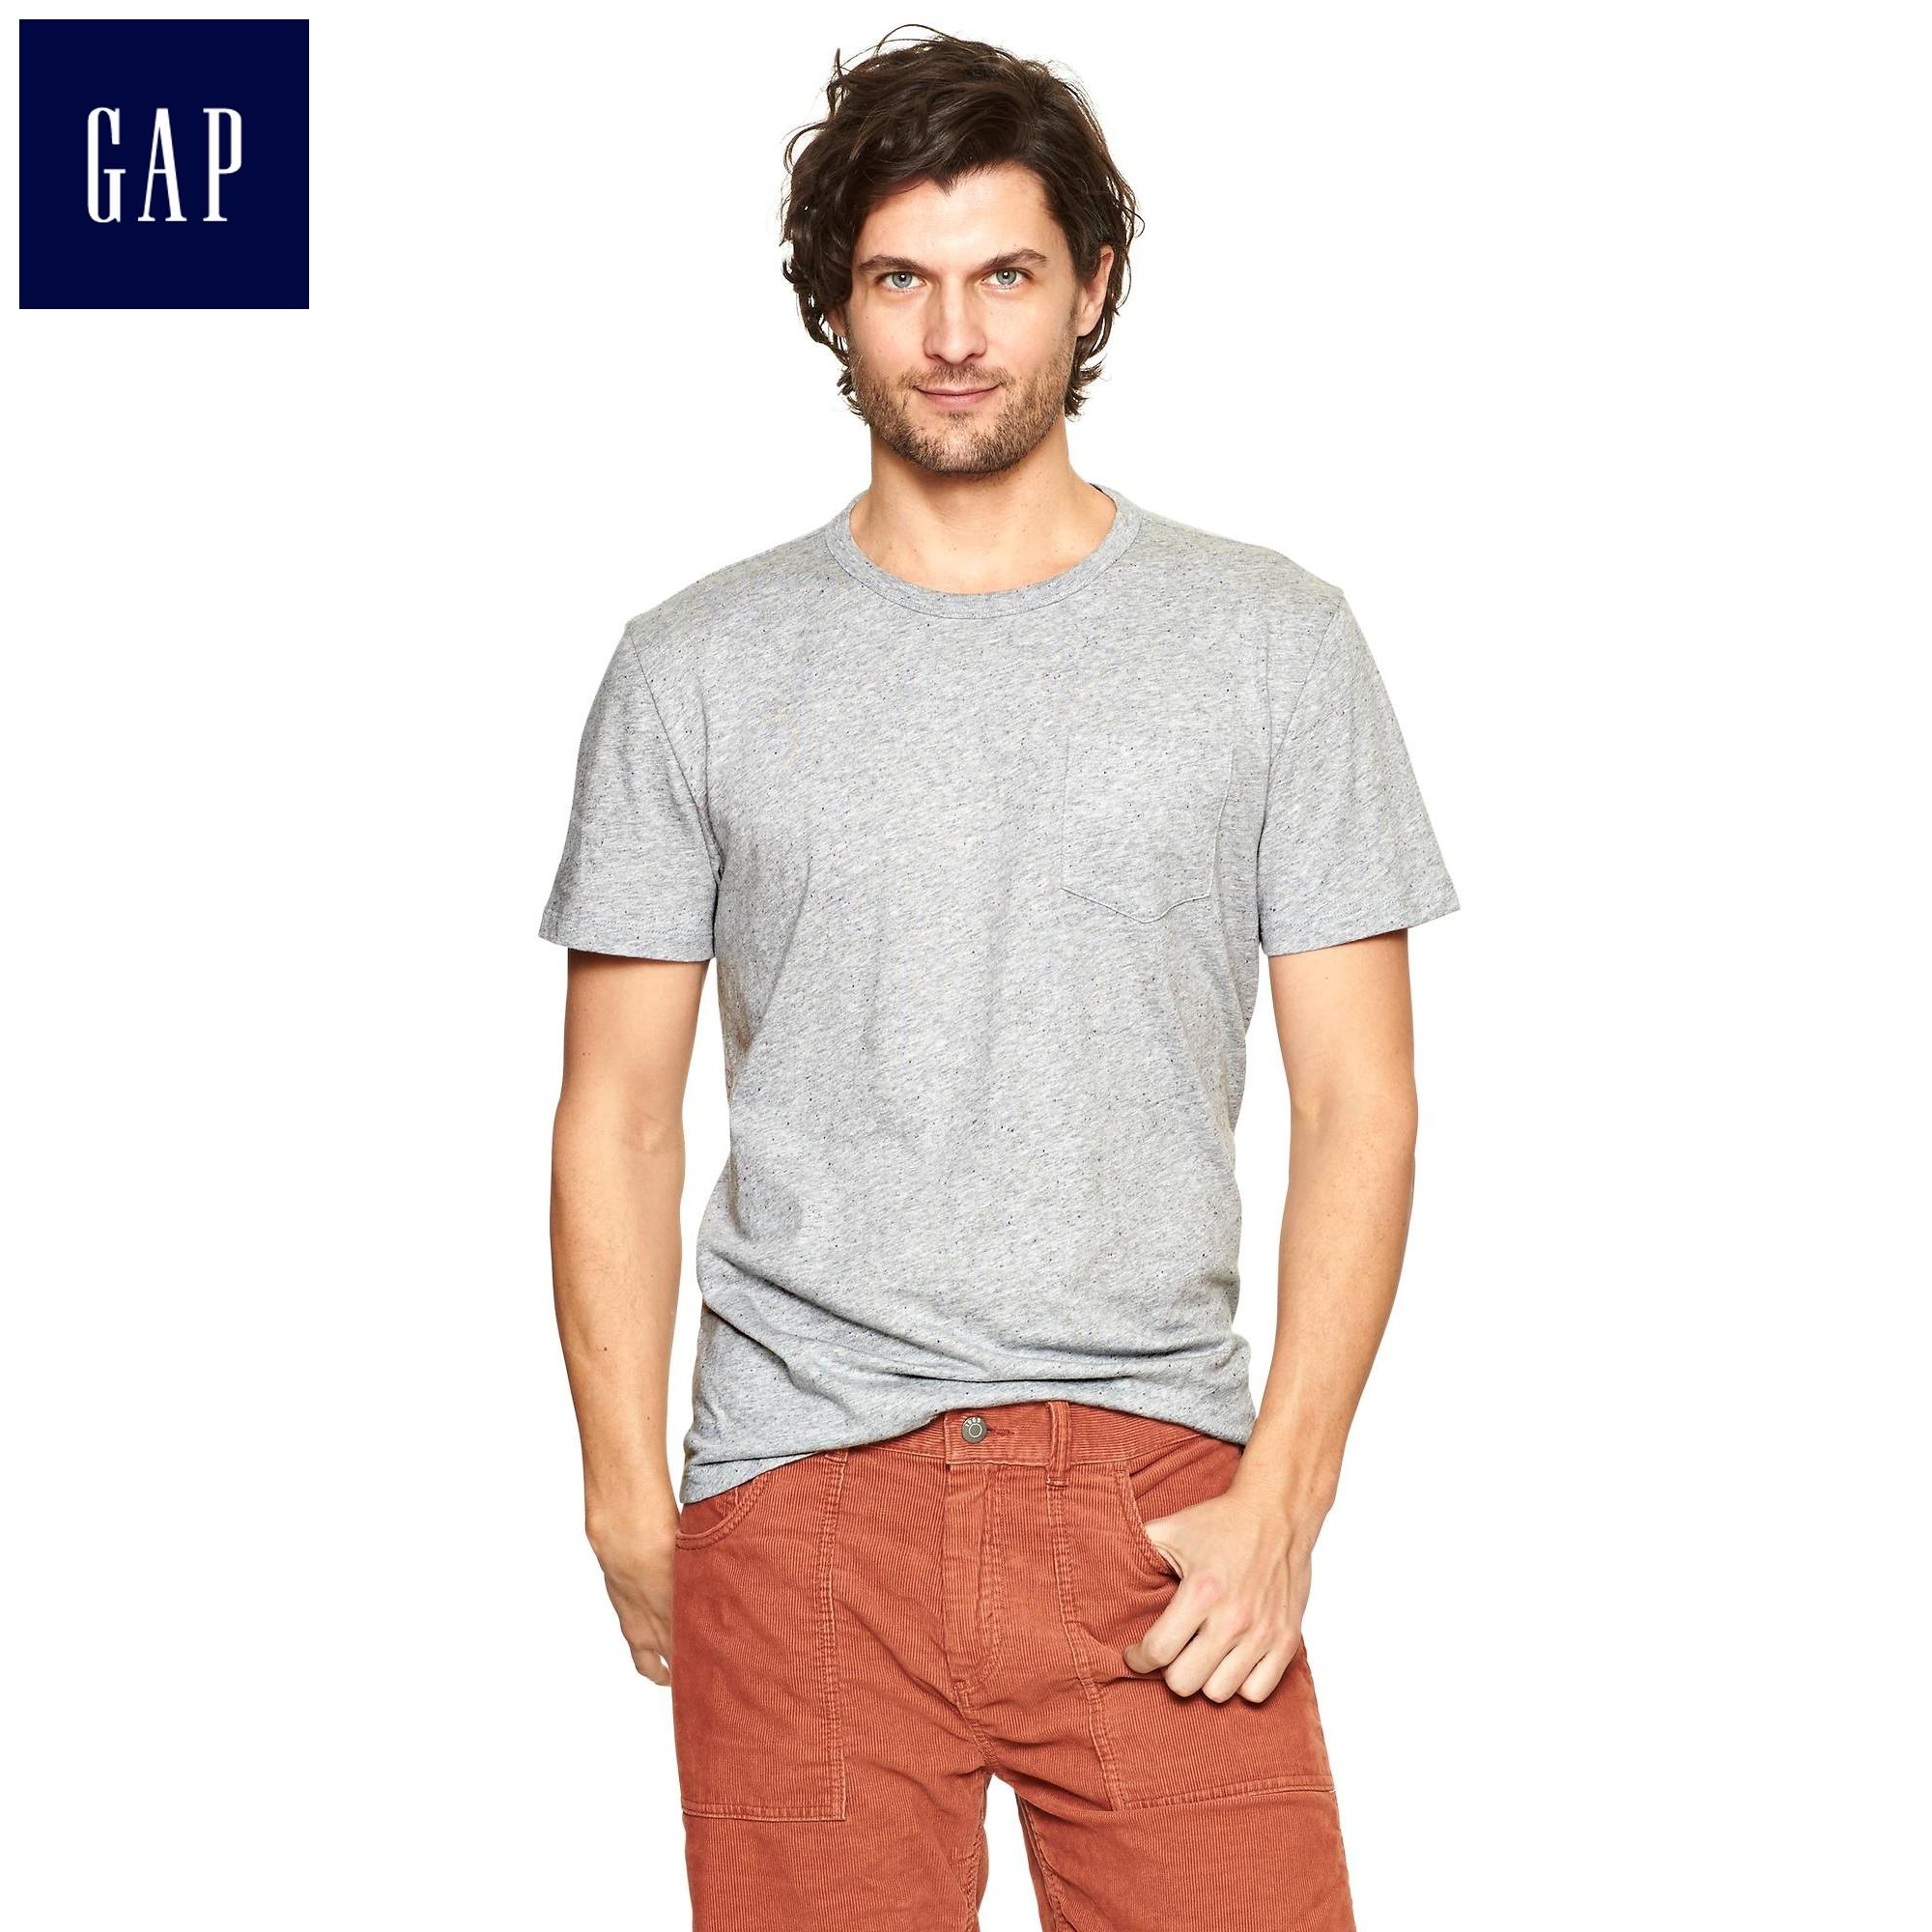 gap小散点柔和纯色棉质t恤男装960482